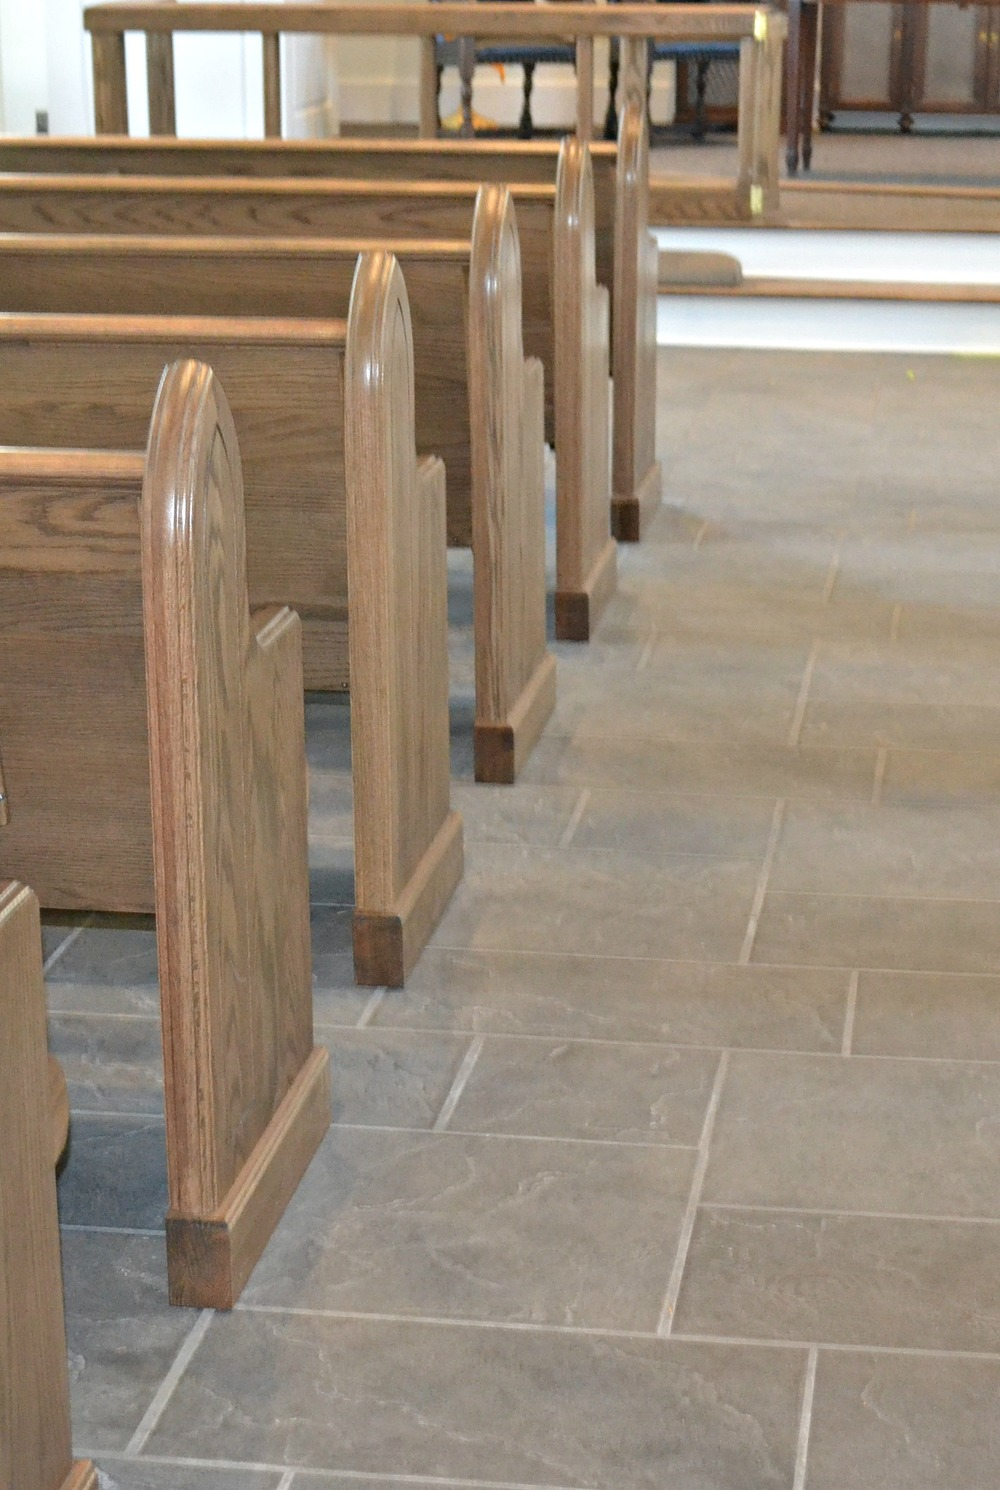 Chapel Floor tile pattern mimics original carriage house slate floor